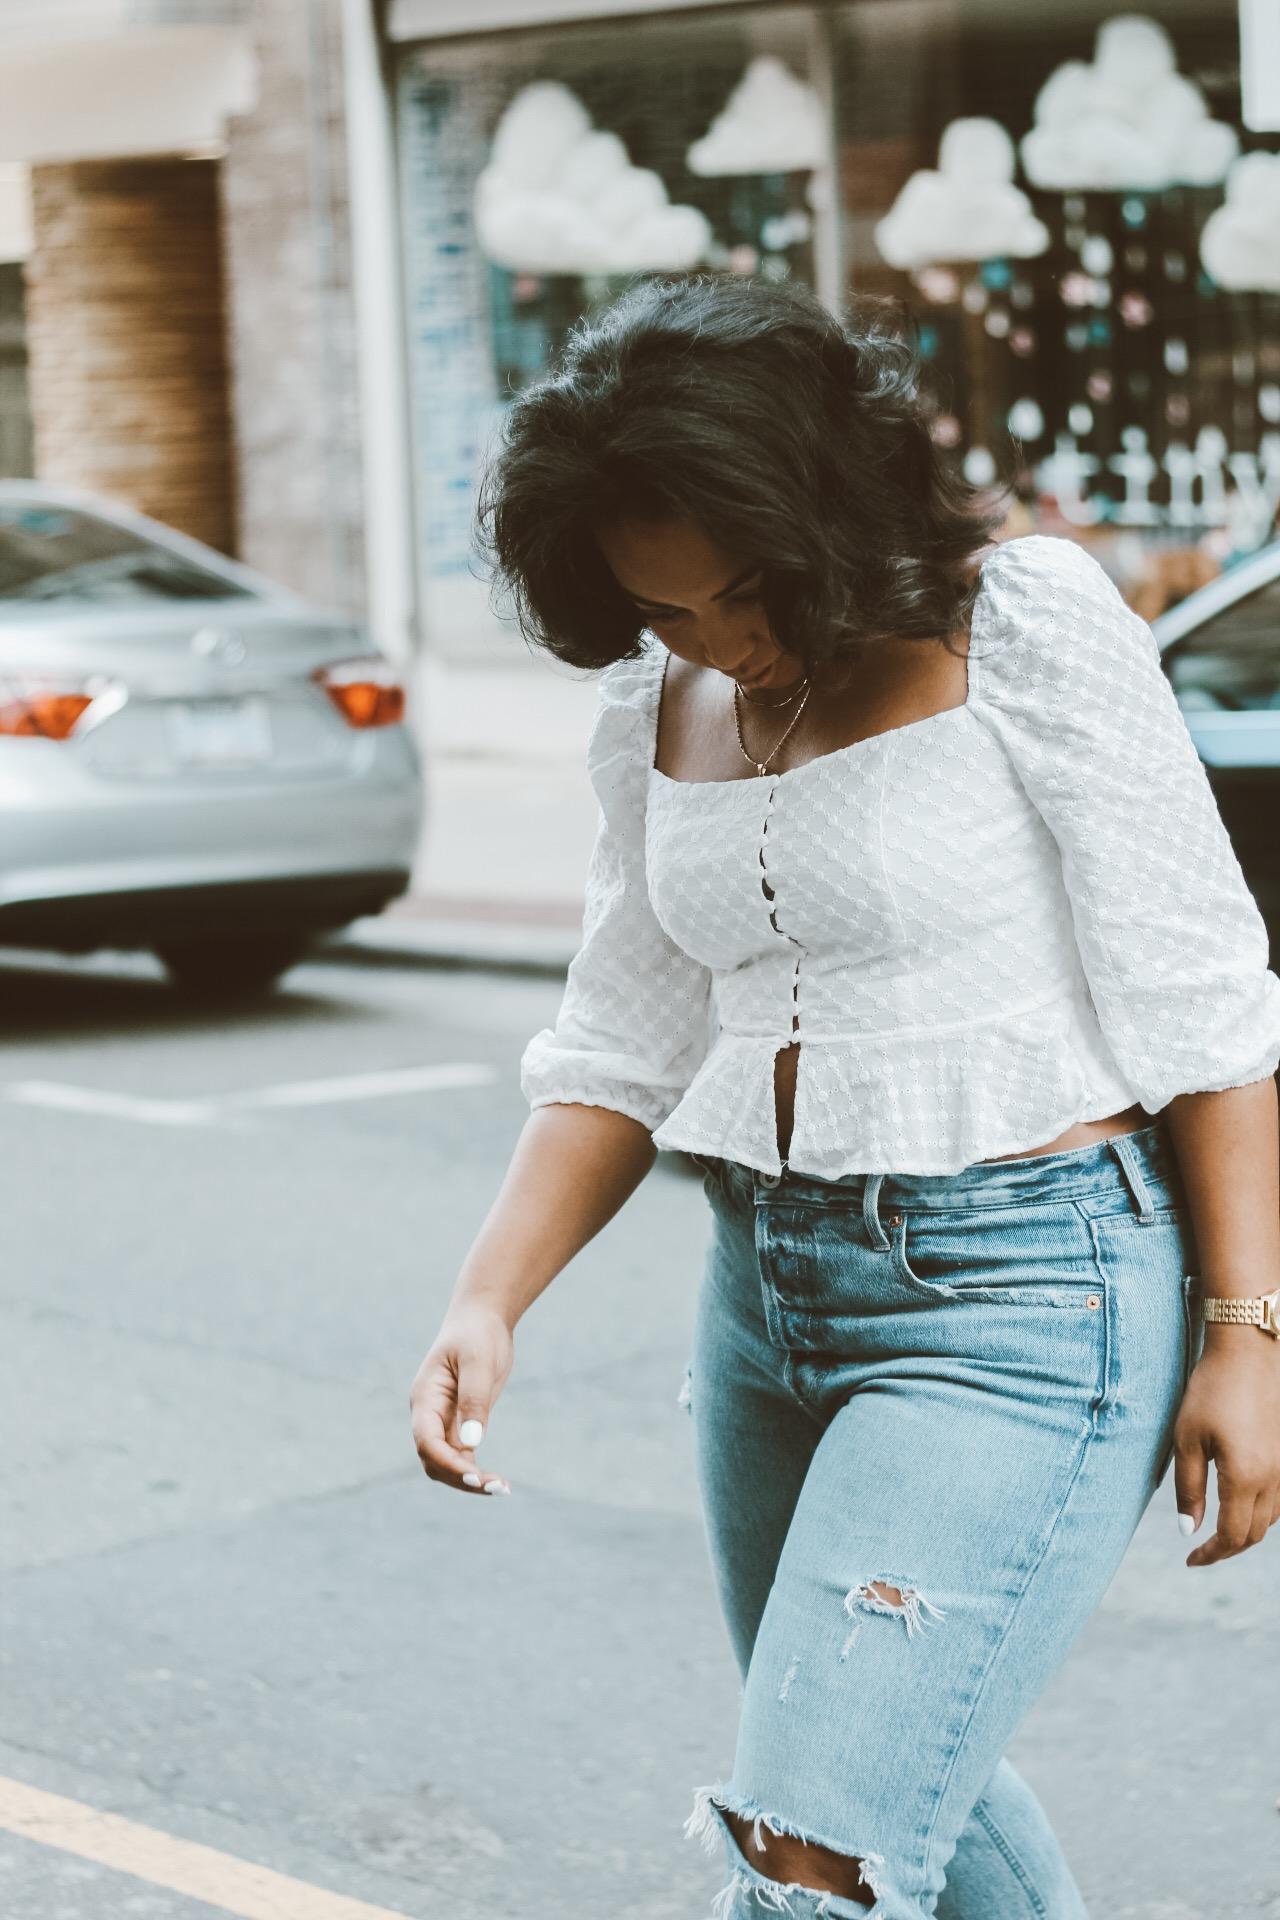 Forever-21-eyelet-blouse-gap-cone-denim-distressed-jeans-zara-orange-leather-heels-5.JPG